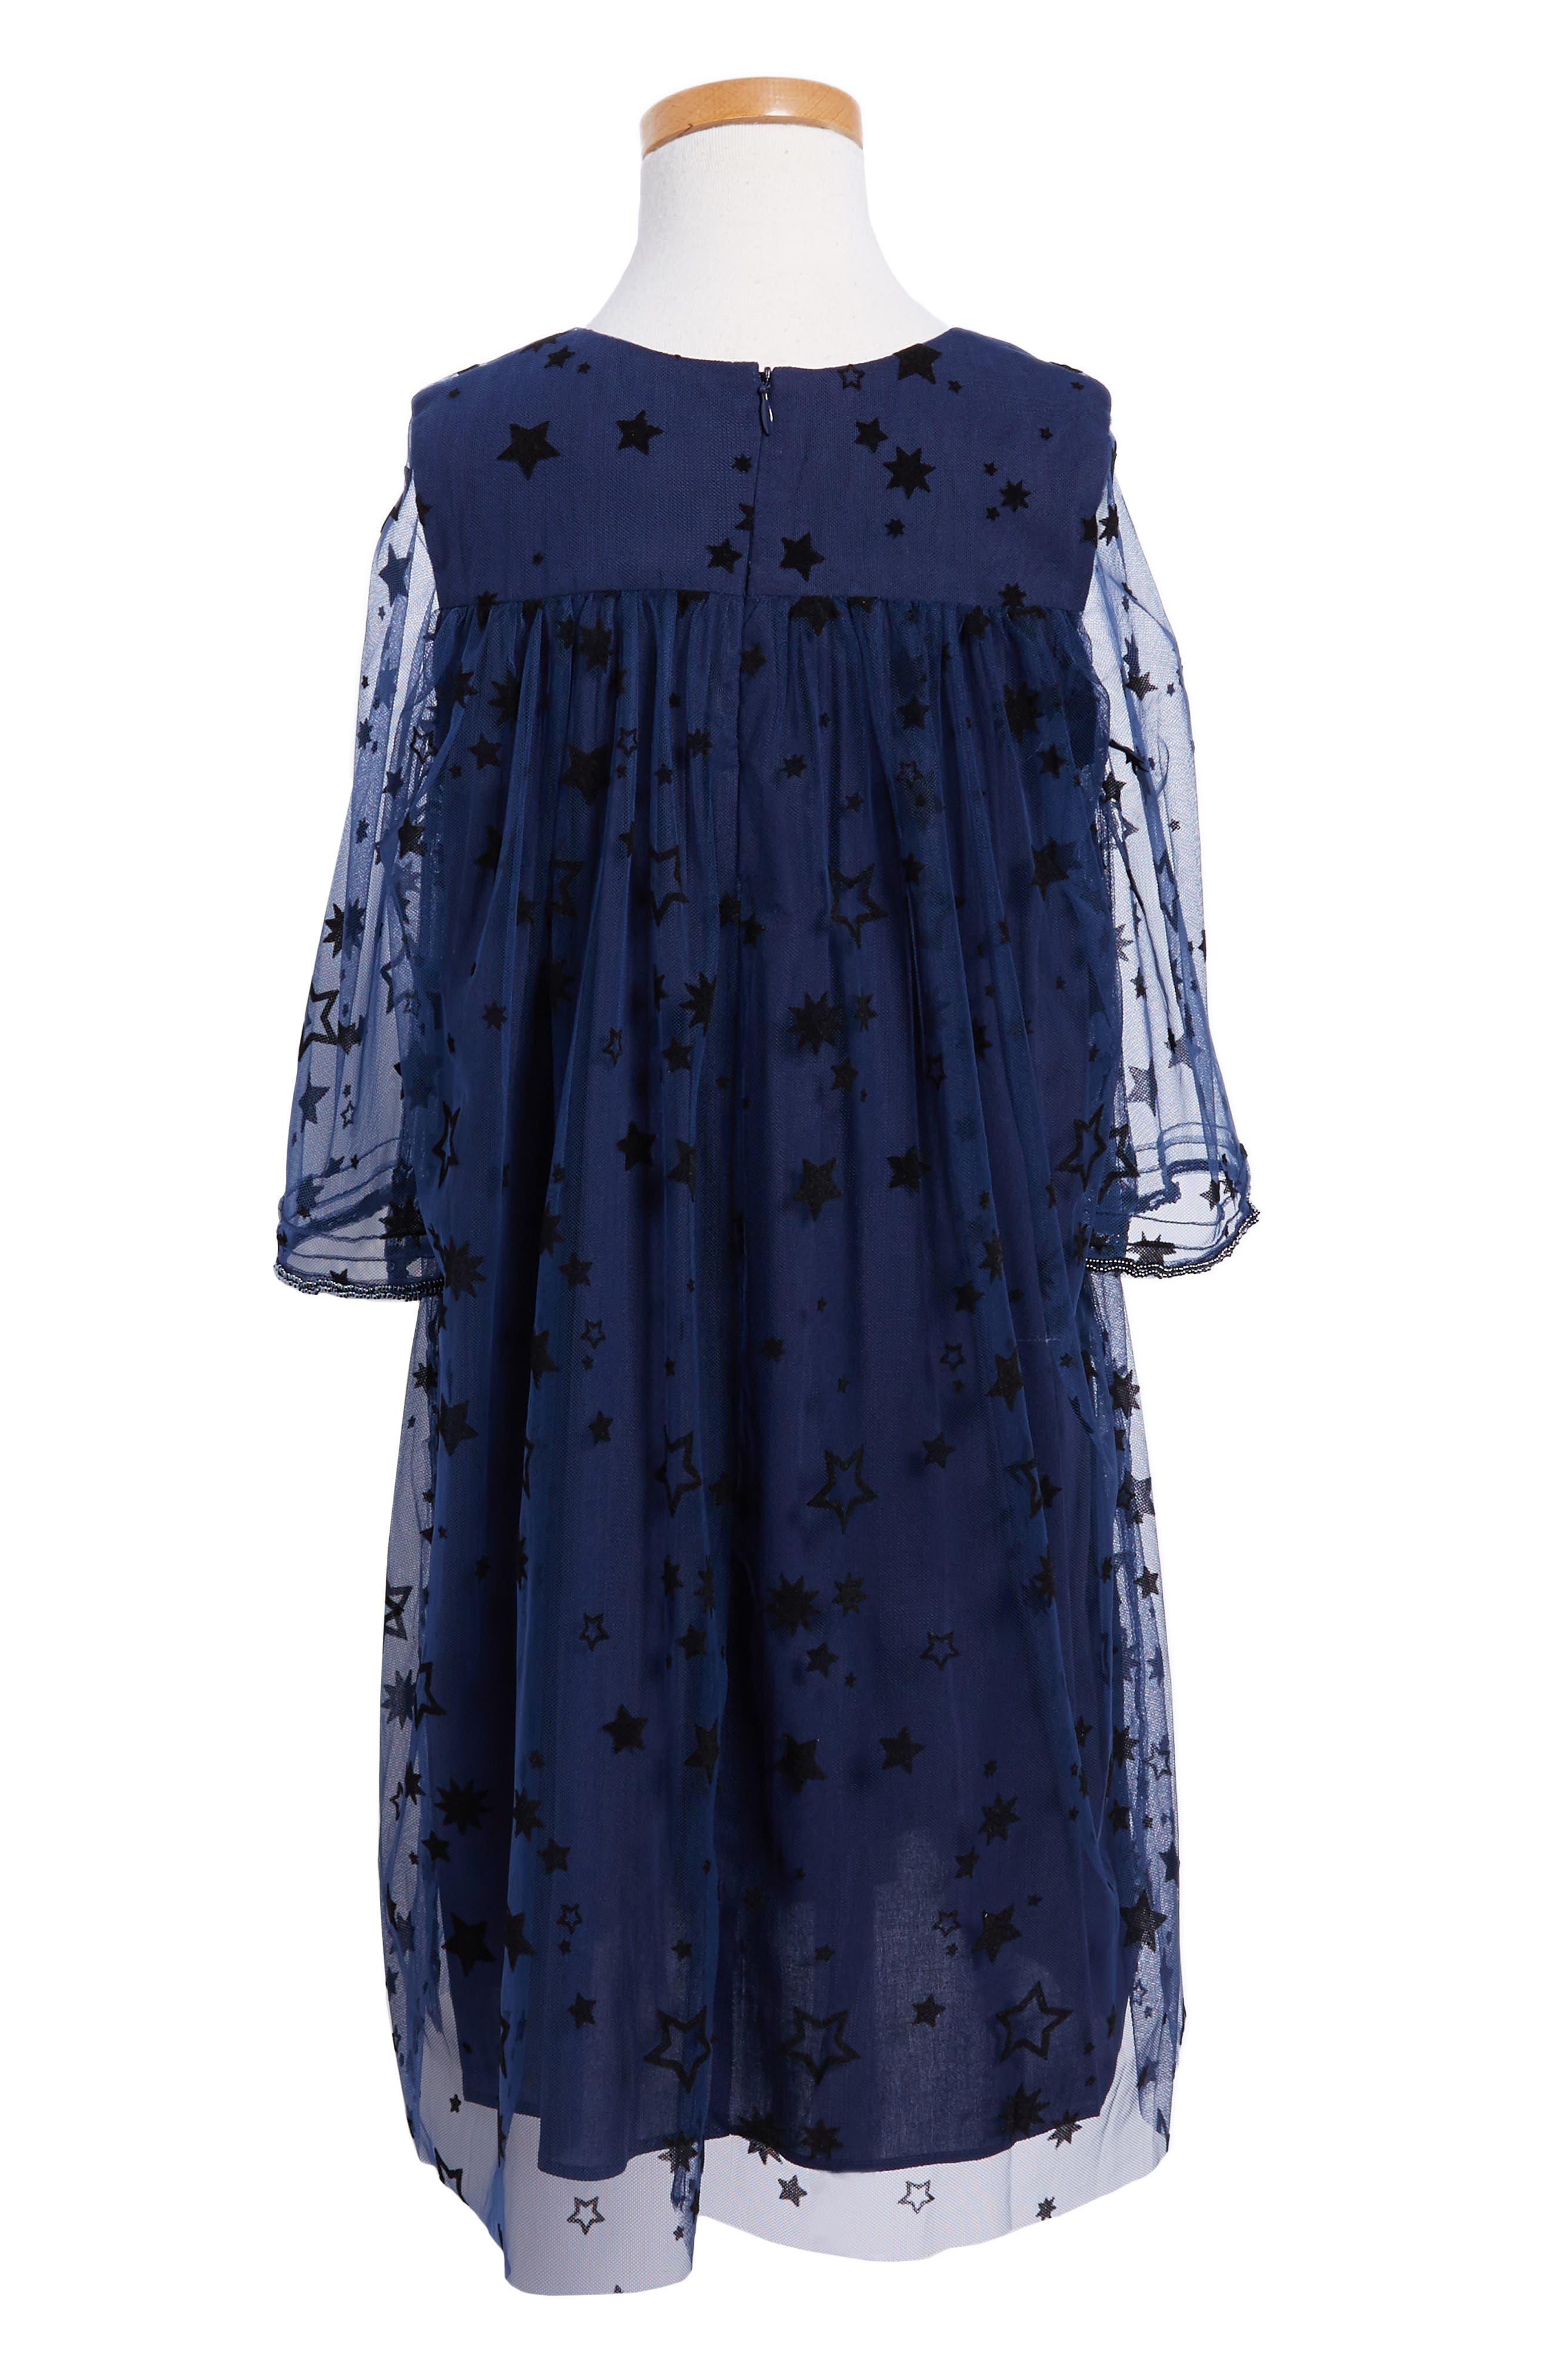 Zodiac Dress,                             Alternate thumbnail 2, color,                             410